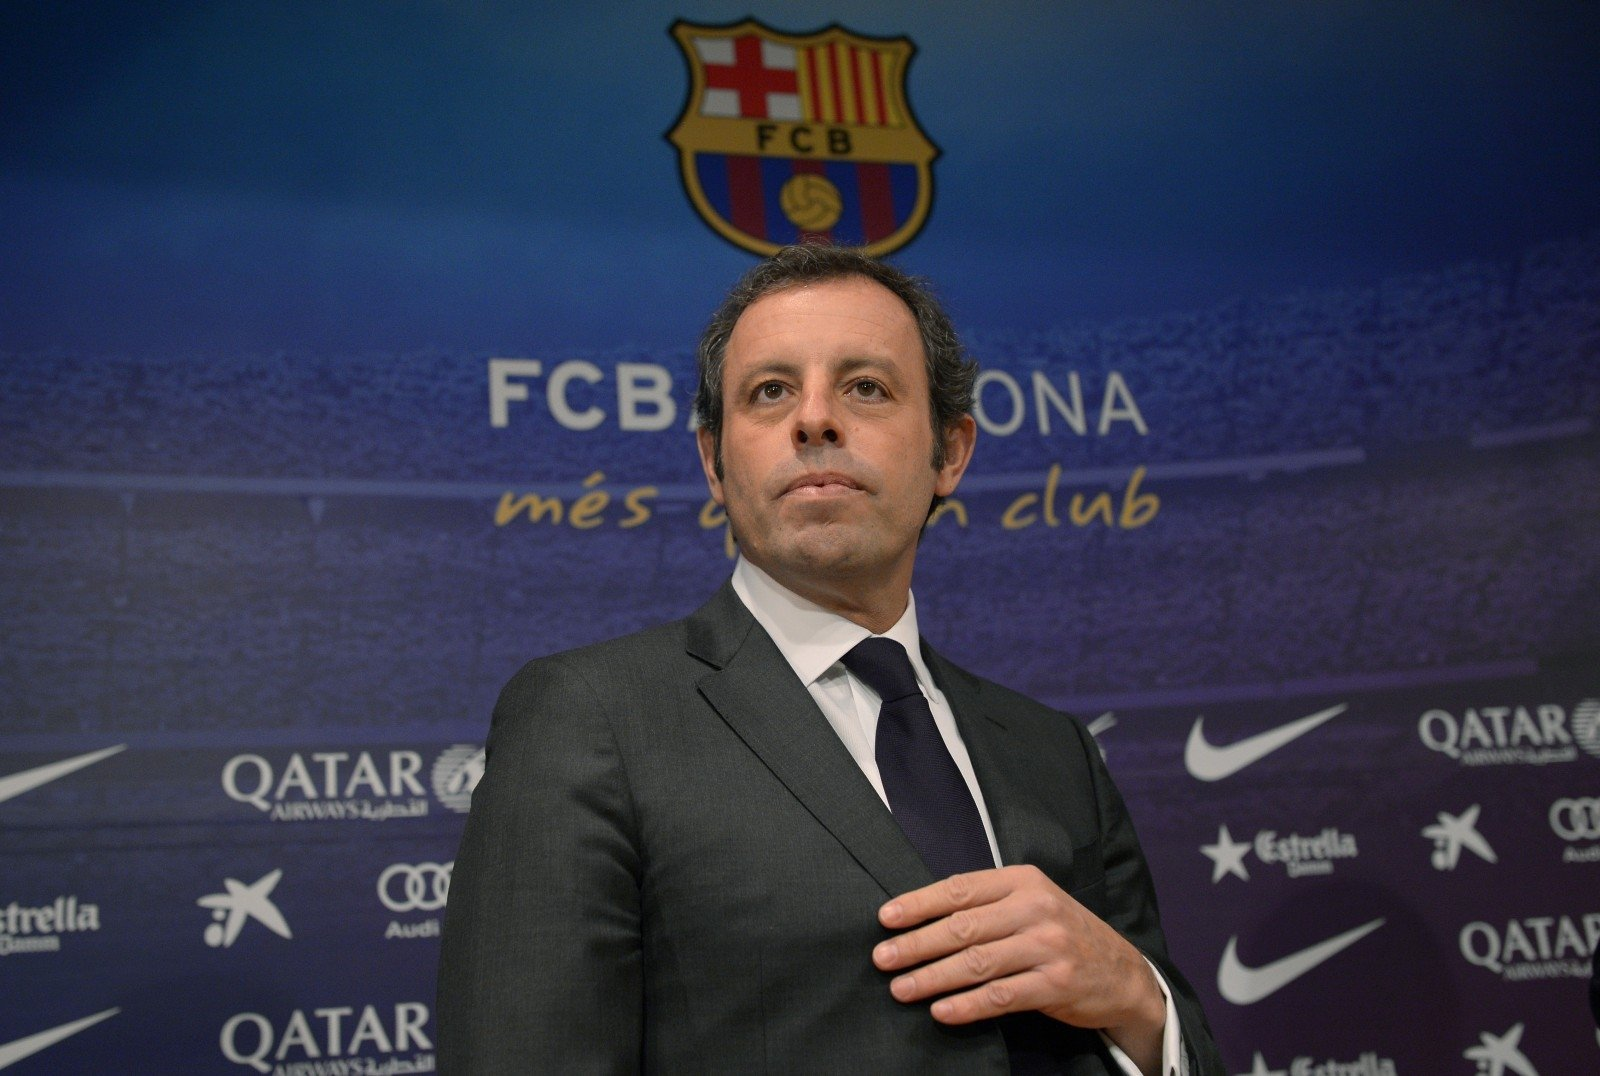 Экс-президент «Барселоны» схвачен поподозрению вотмывании €15 млн